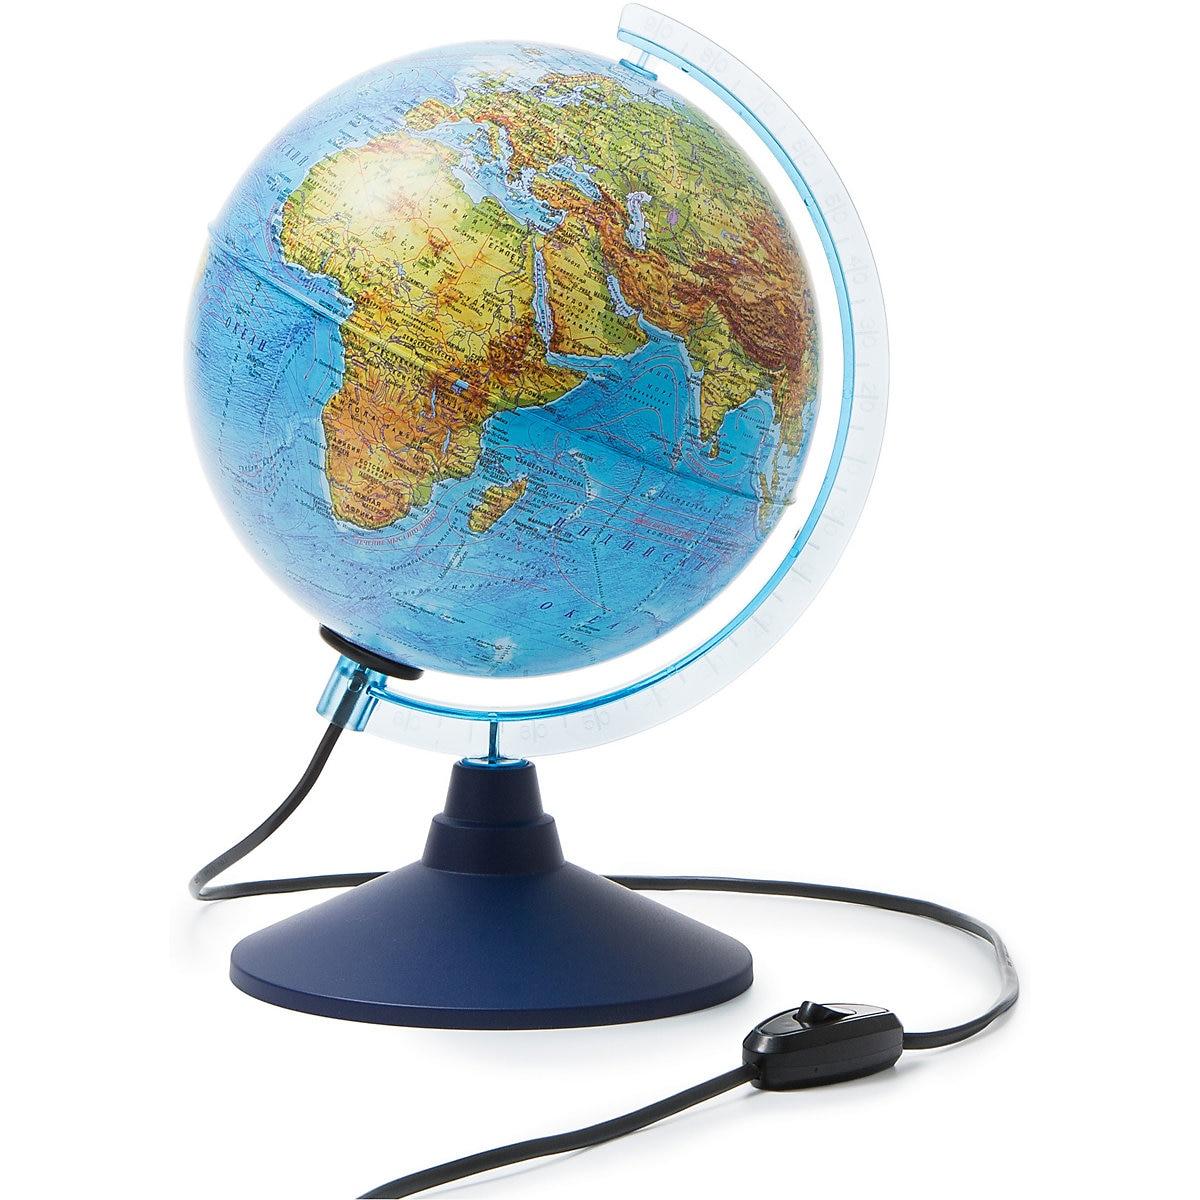 GLOBEN Desk Set 8690499 Globe Accessories Organizer For Office And School Schools Offices MTpromo